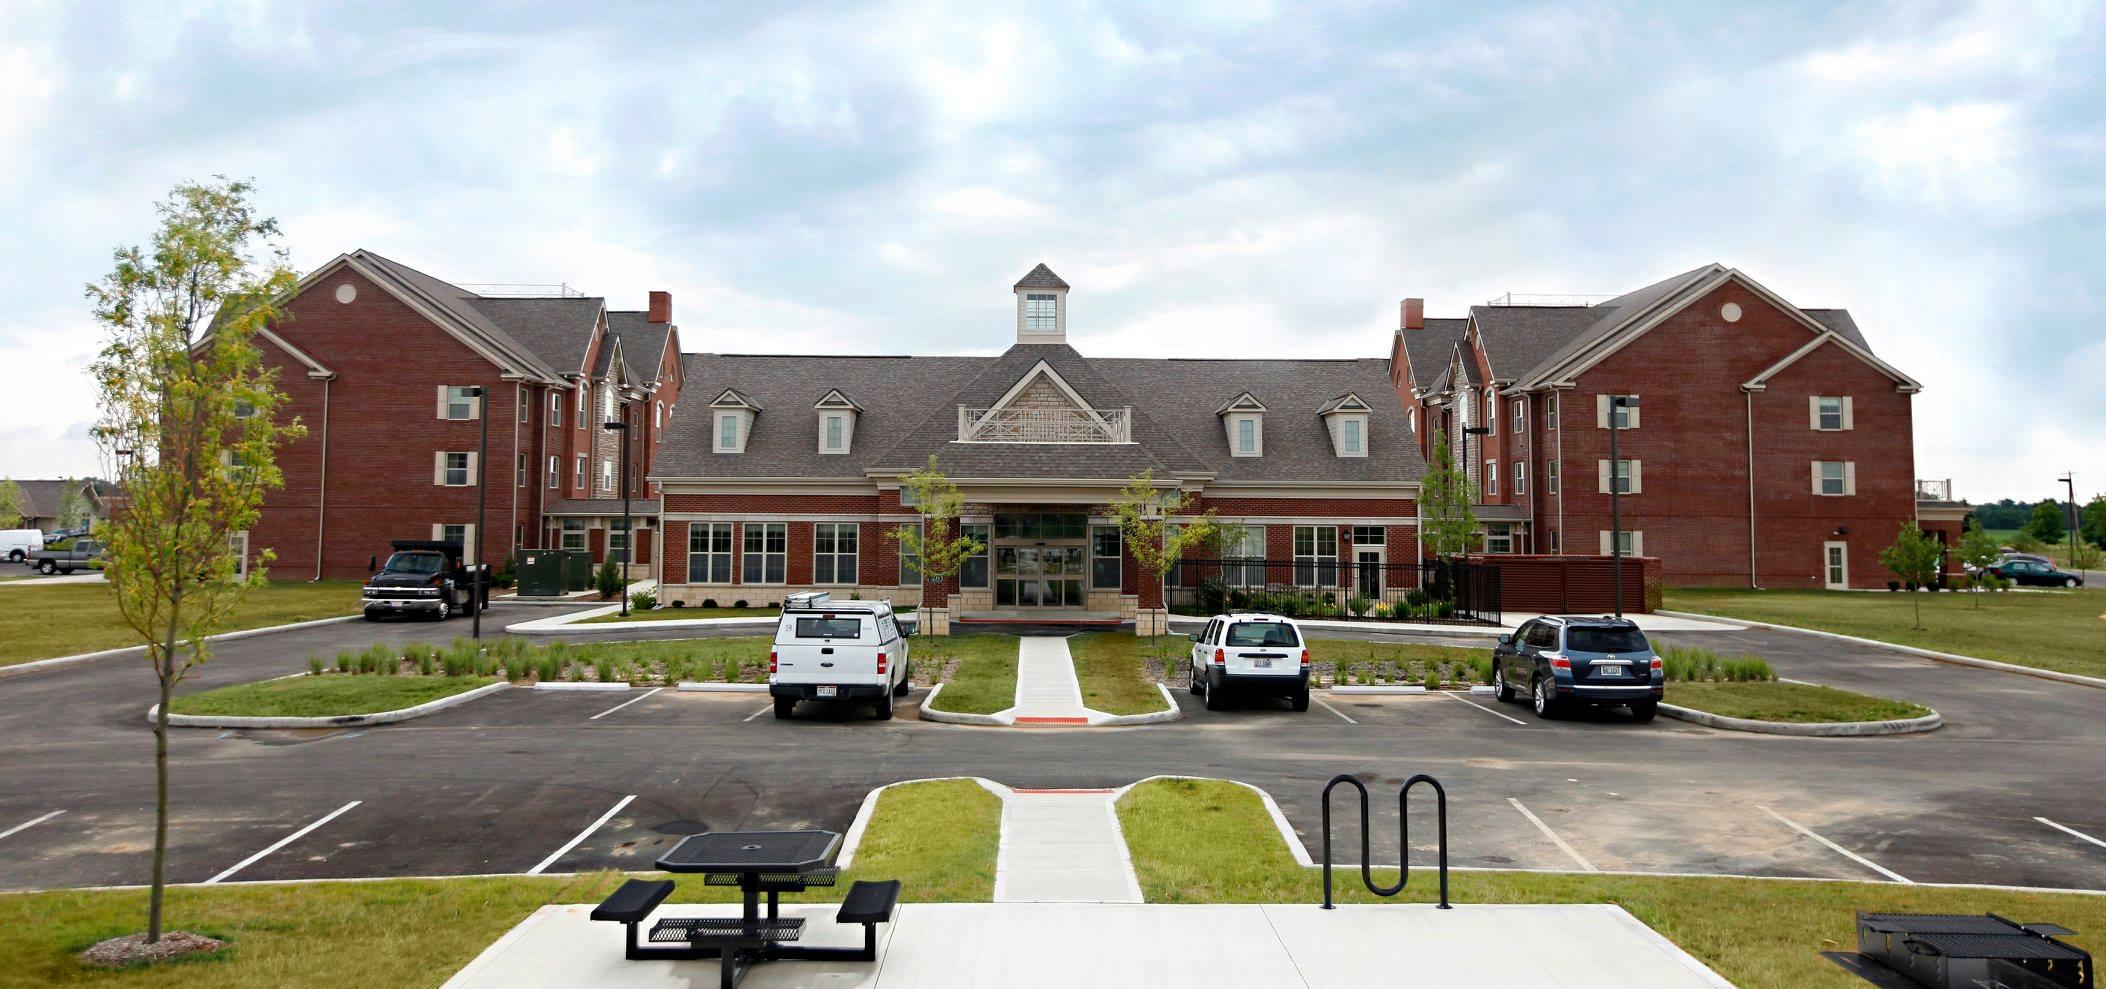 Image of Avondale Senior Village